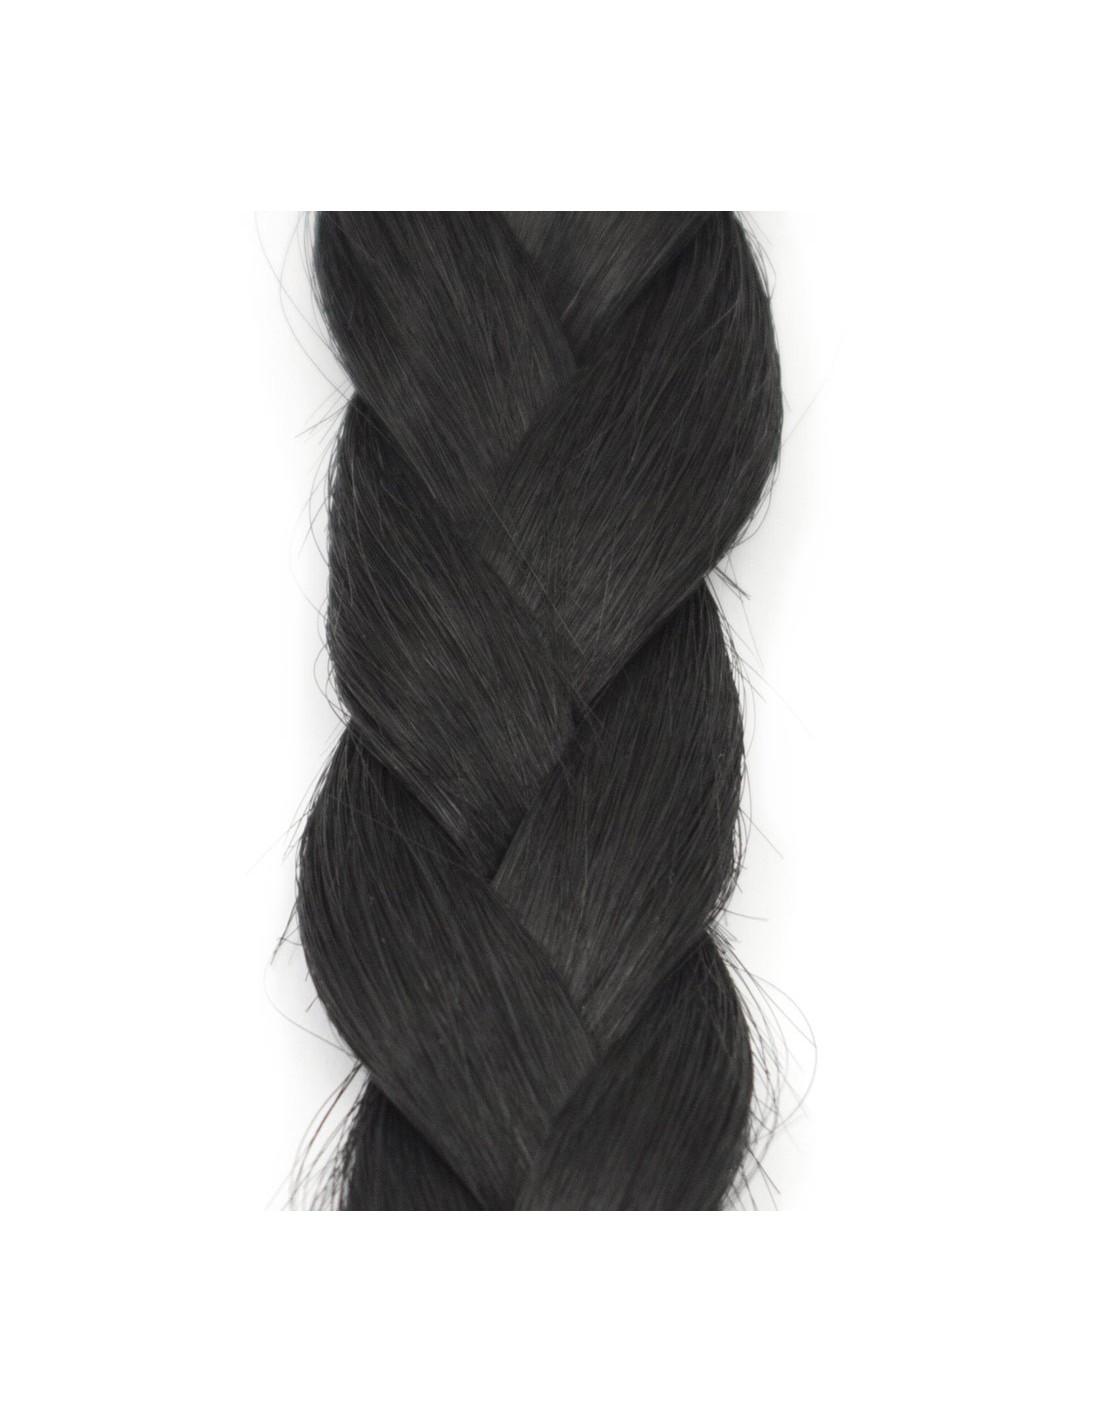 extension cheveux noir extension adh sive extens hair. Black Bedroom Furniture Sets. Home Design Ideas